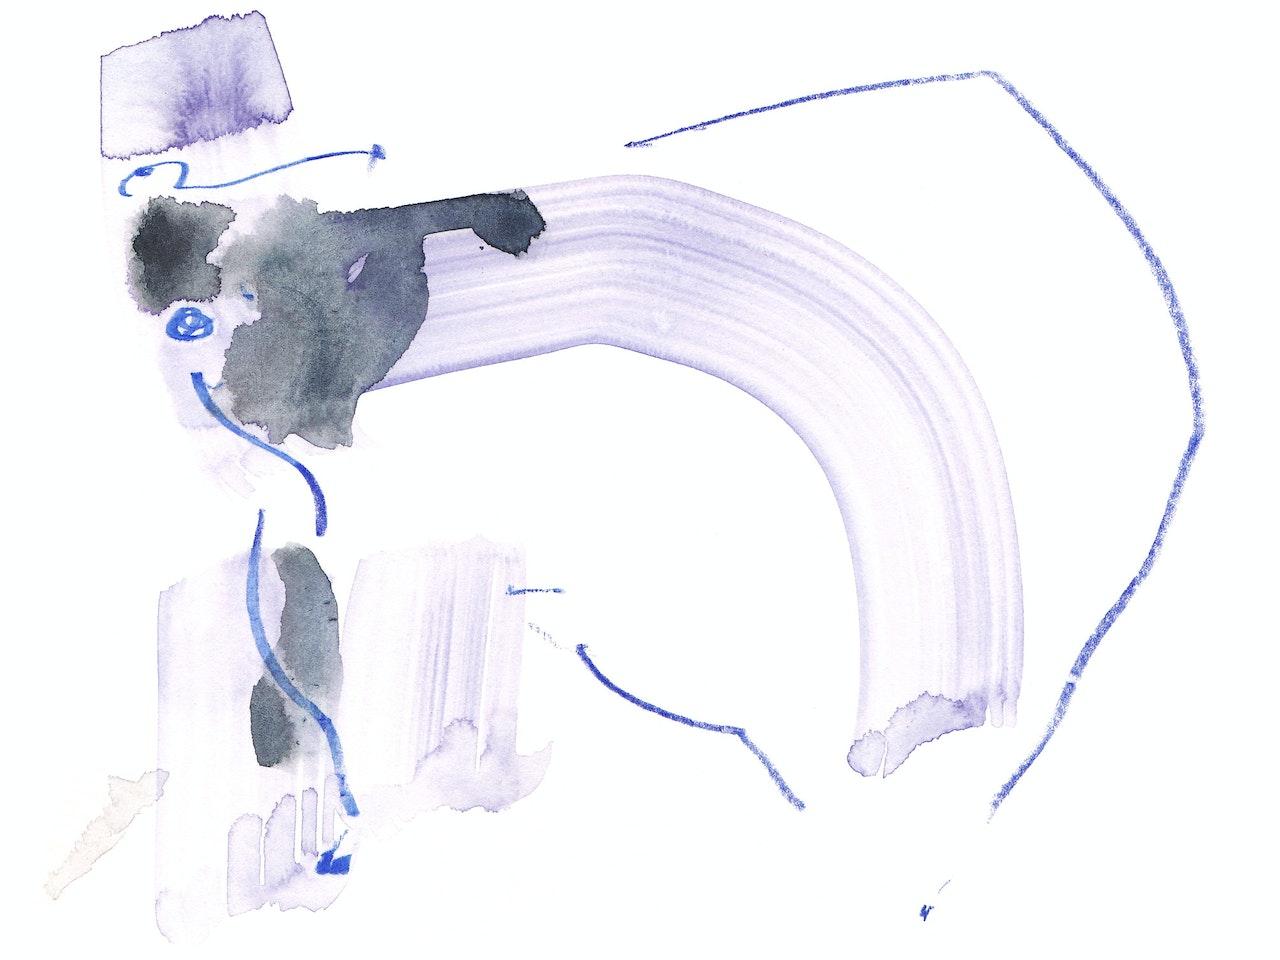 Vicky Bentham Green 16.01.15 Polar Bear1 Unpublished